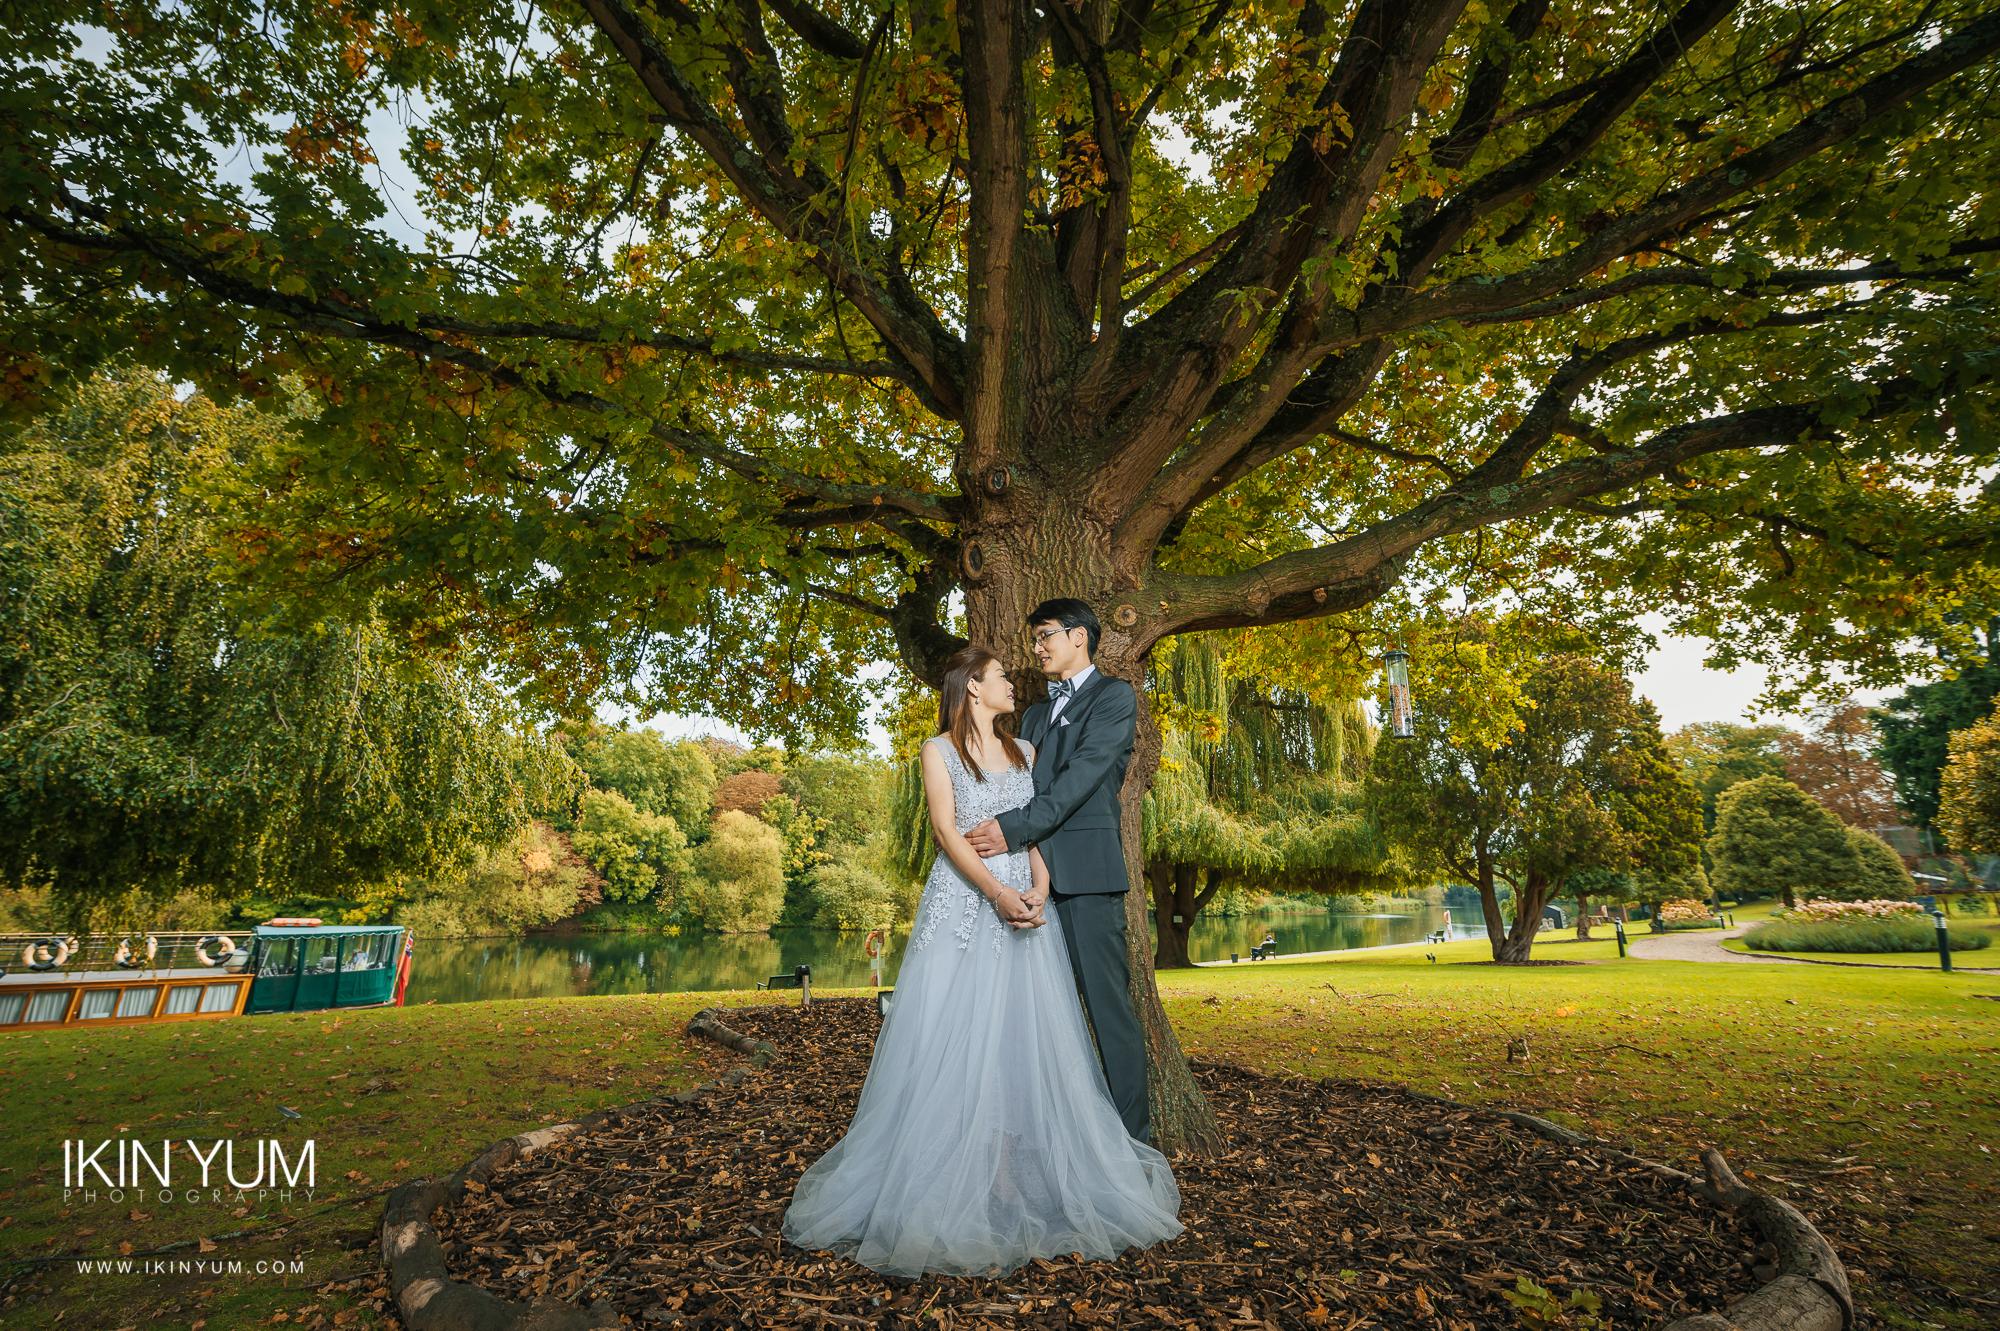 The oakley court Pre-Wedding Shoot - Ikin Yum Photography-033.jpg